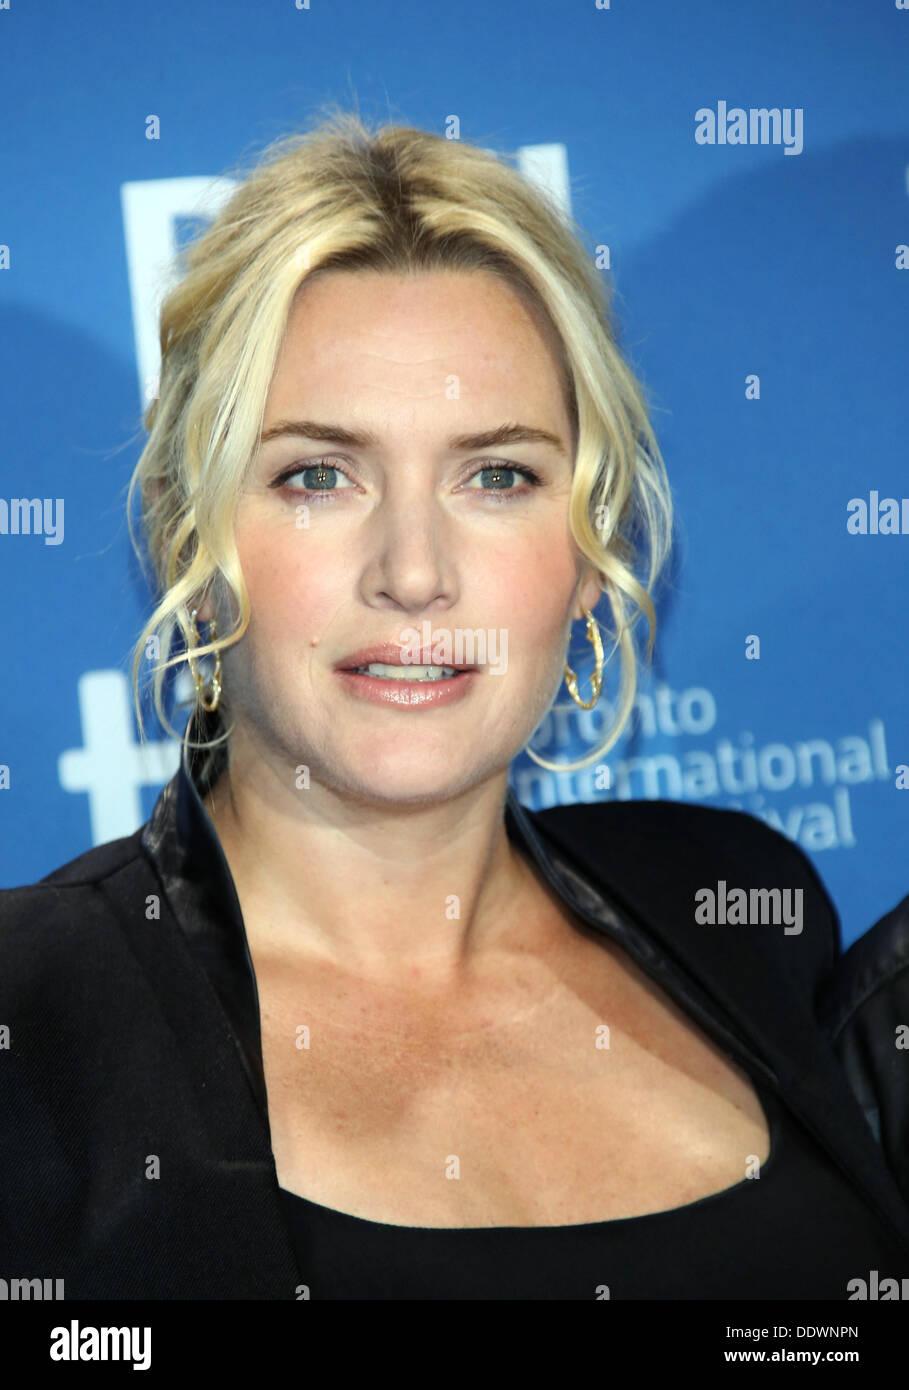 Communication on this topic: Aleksandra Rastovic HRV, kate-bell-australian-actress/